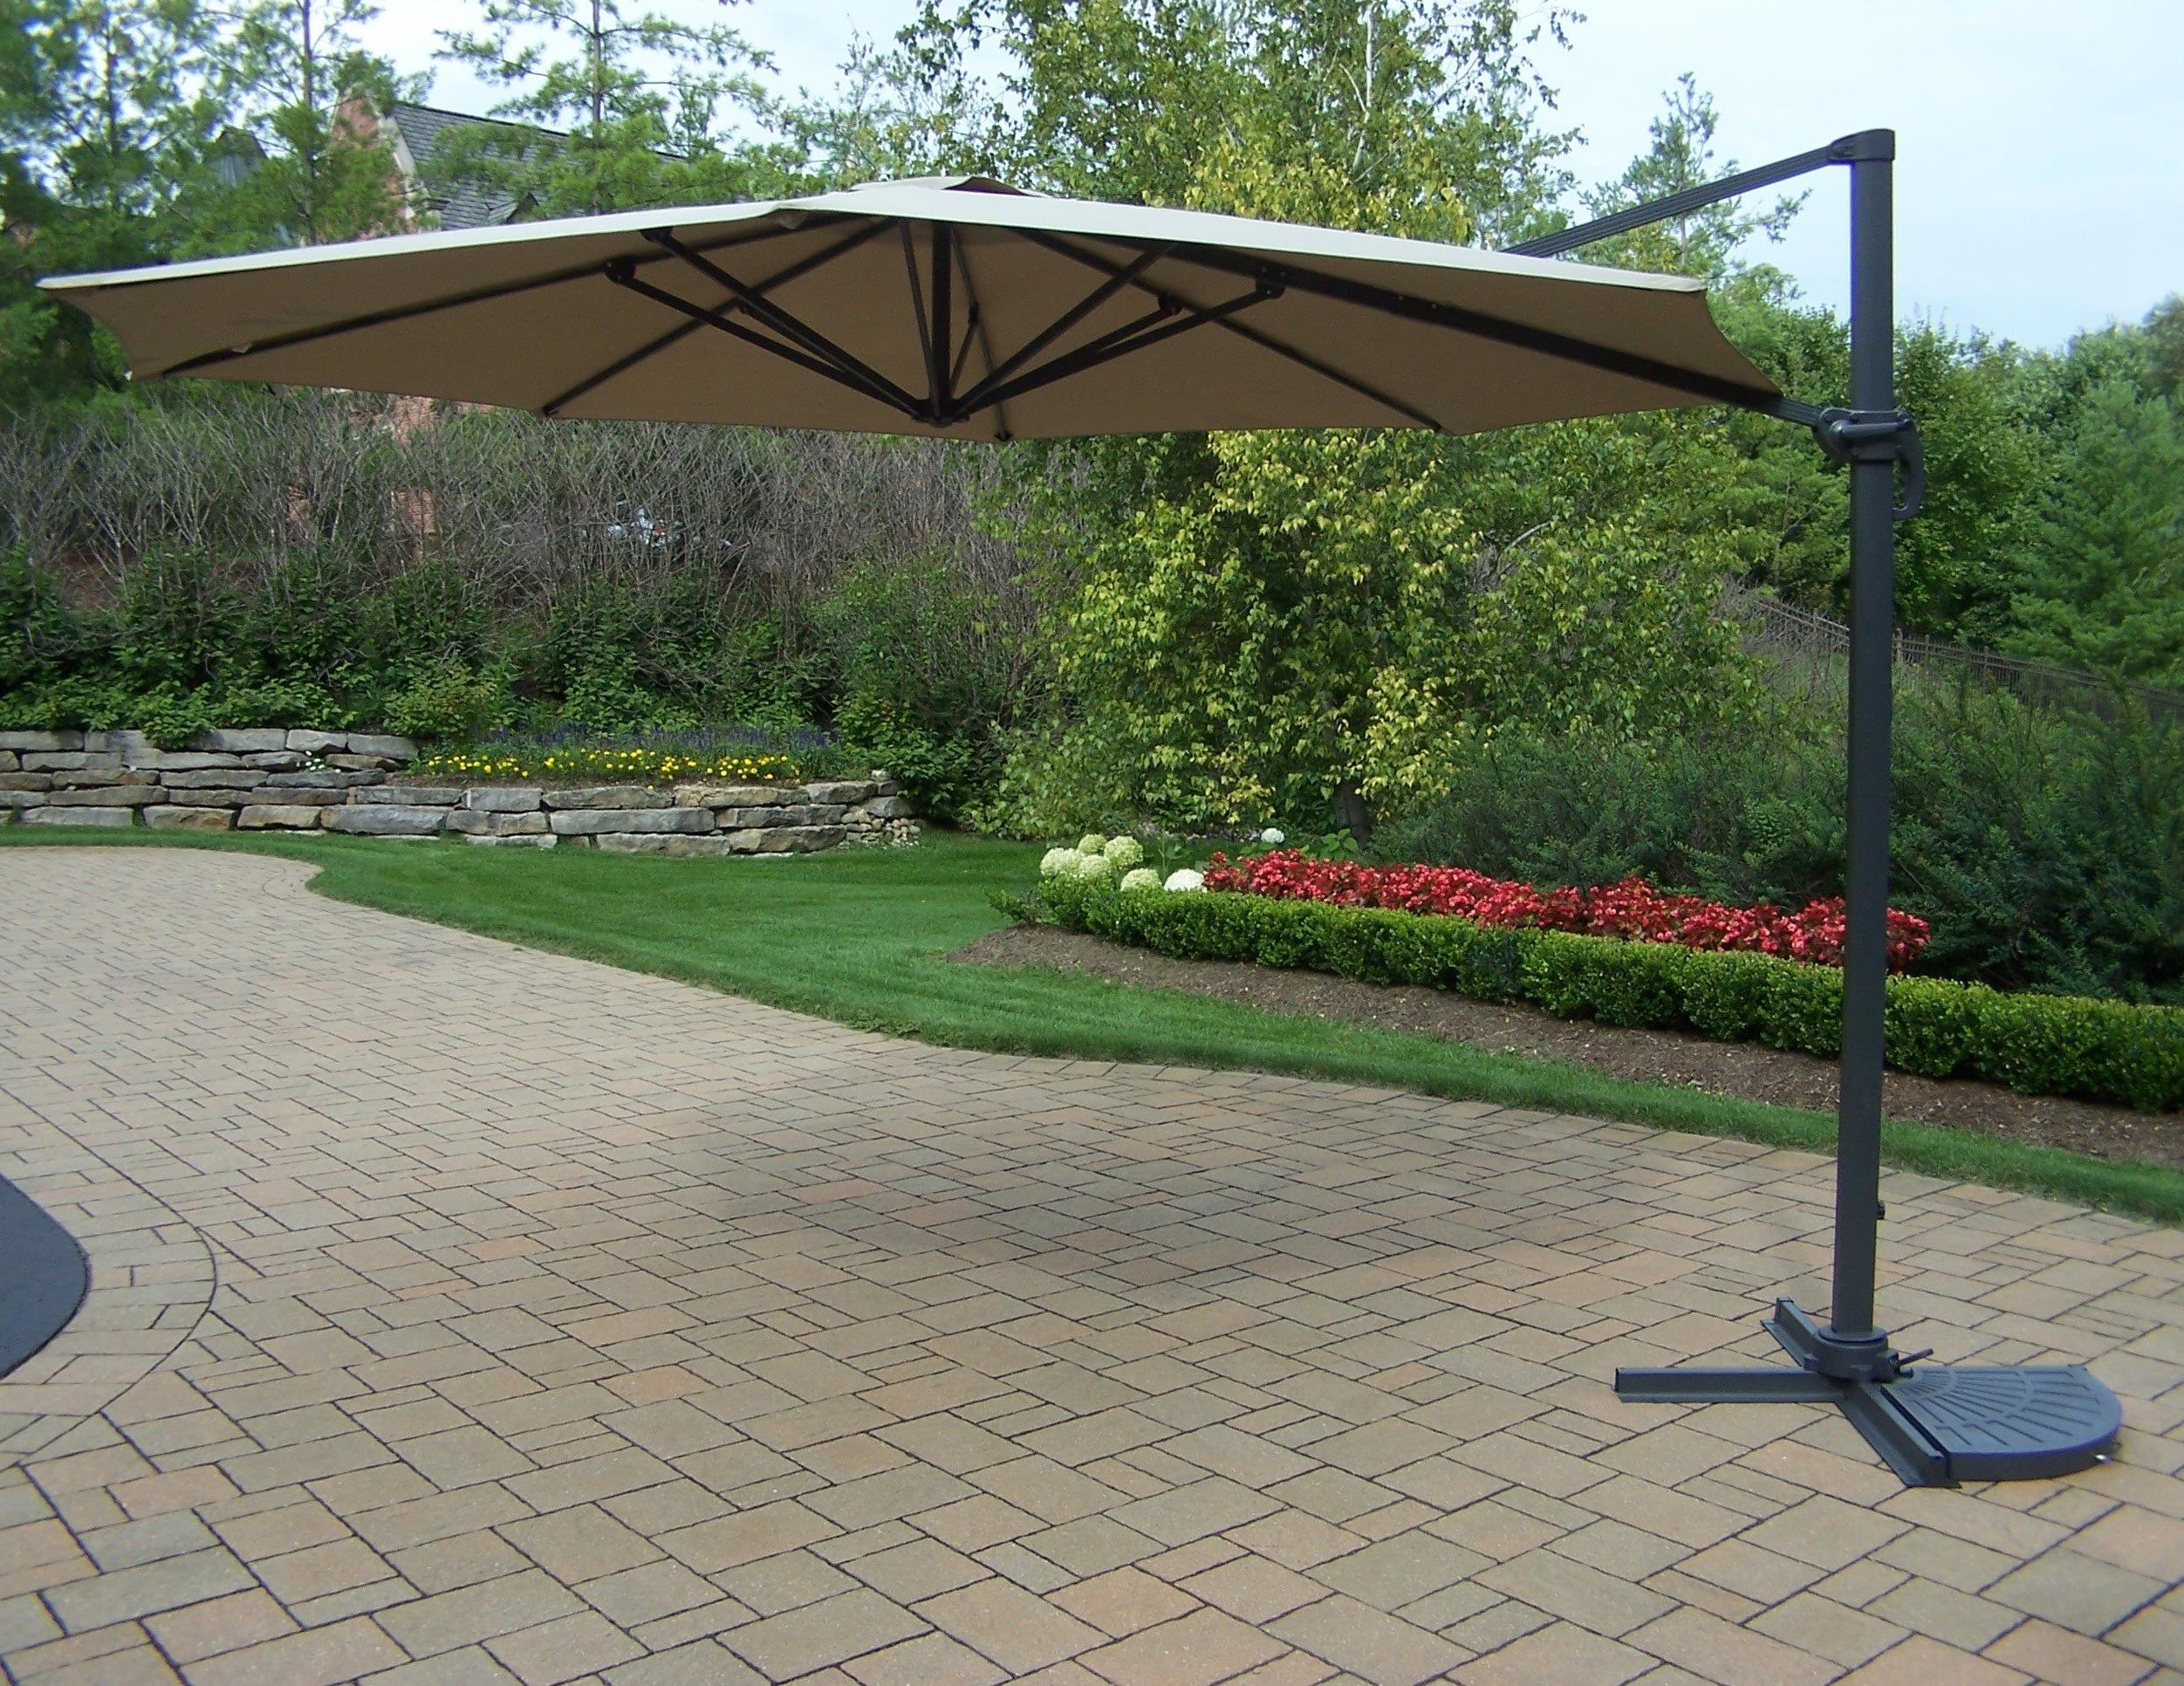 Popular Olen Cantilever Umbrellas With Regard To 11' Cantilever Umbrella (View 19 of 20)